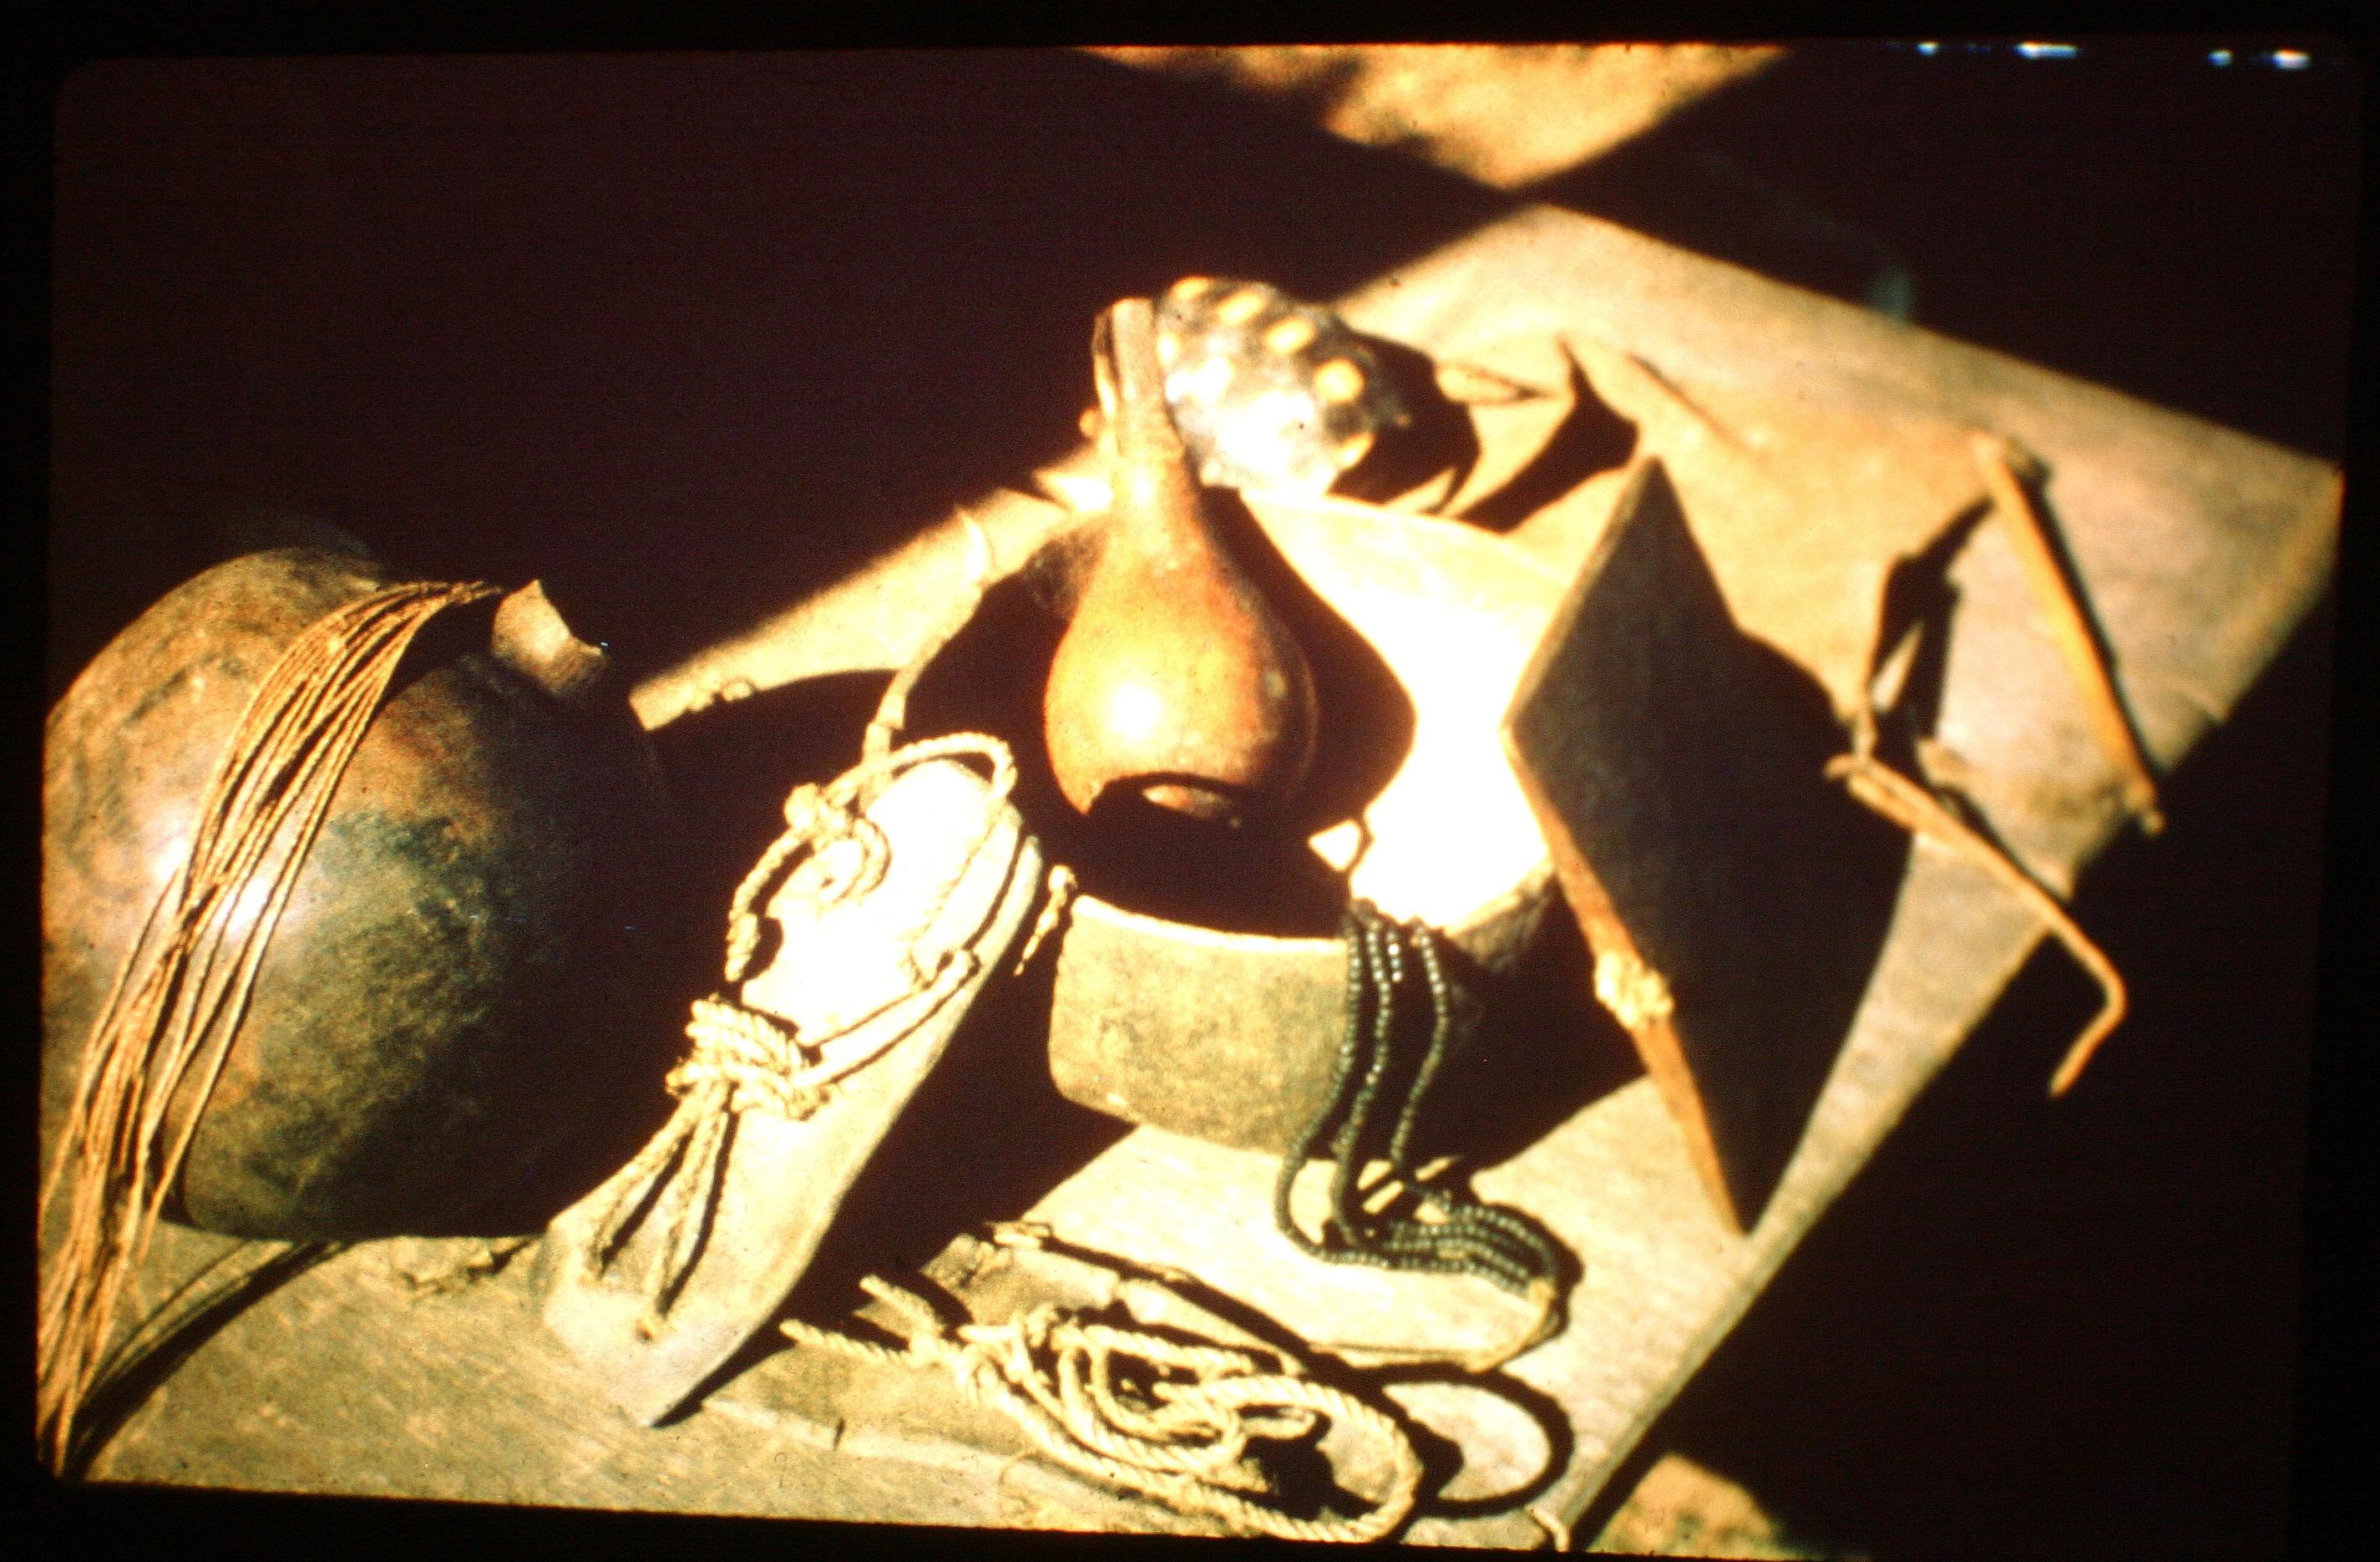 Ayoré artifacts - clay water jug, tapir hide sandals, maraca, gourd bowl, wooden whistle, woman's beads, men's rope